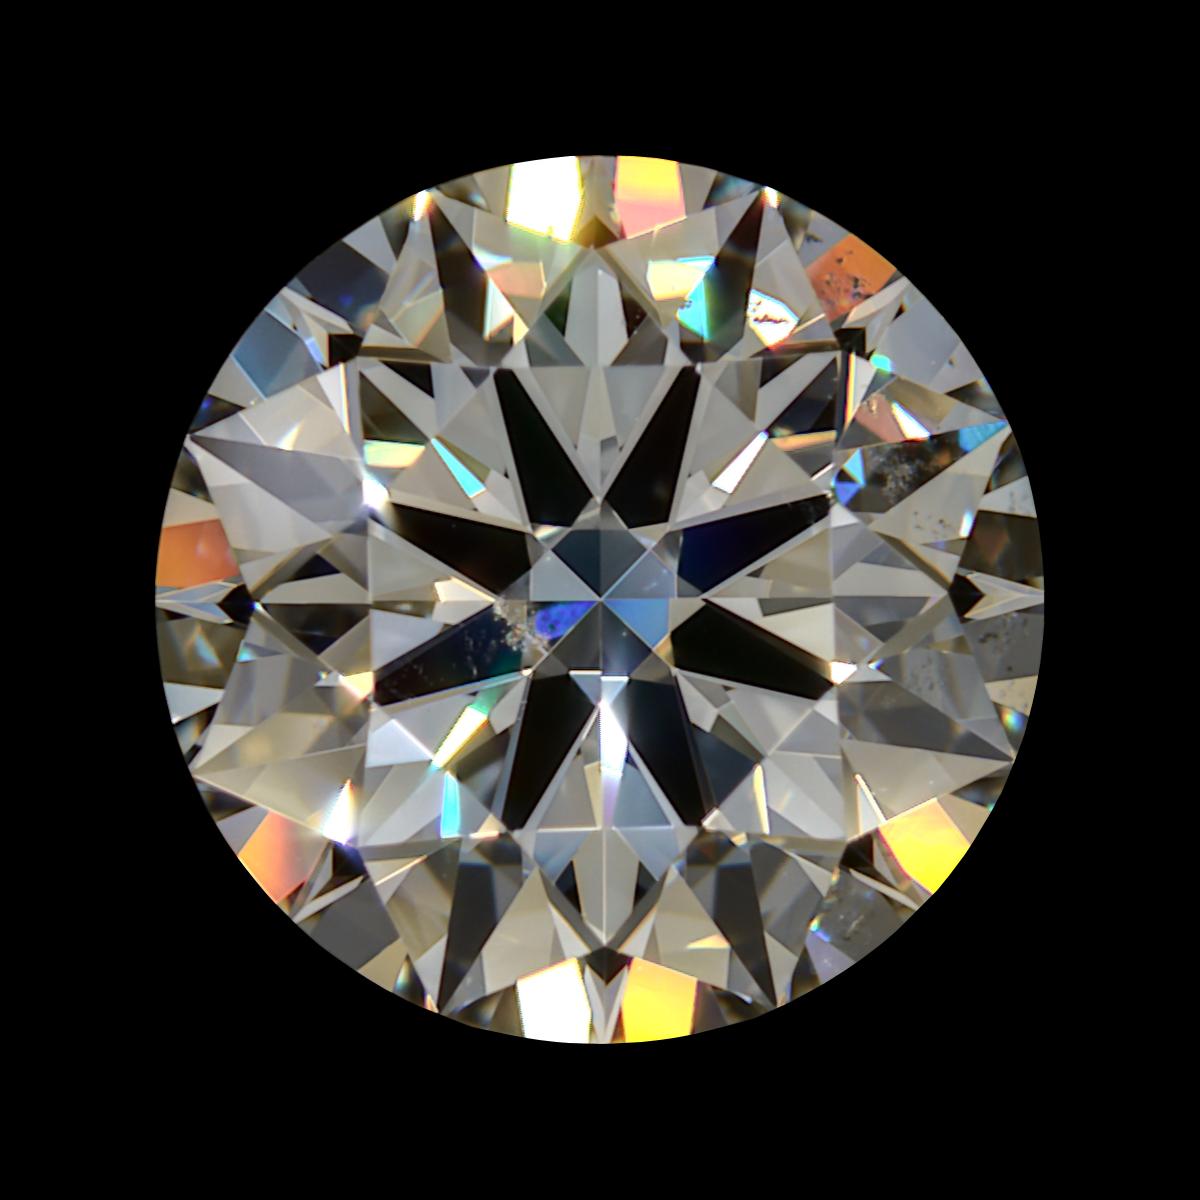 https://cdn.briangavindiamonds.com/files/mp4/AGS-104110345008/AGS-104110345008-Fire-02.mp4